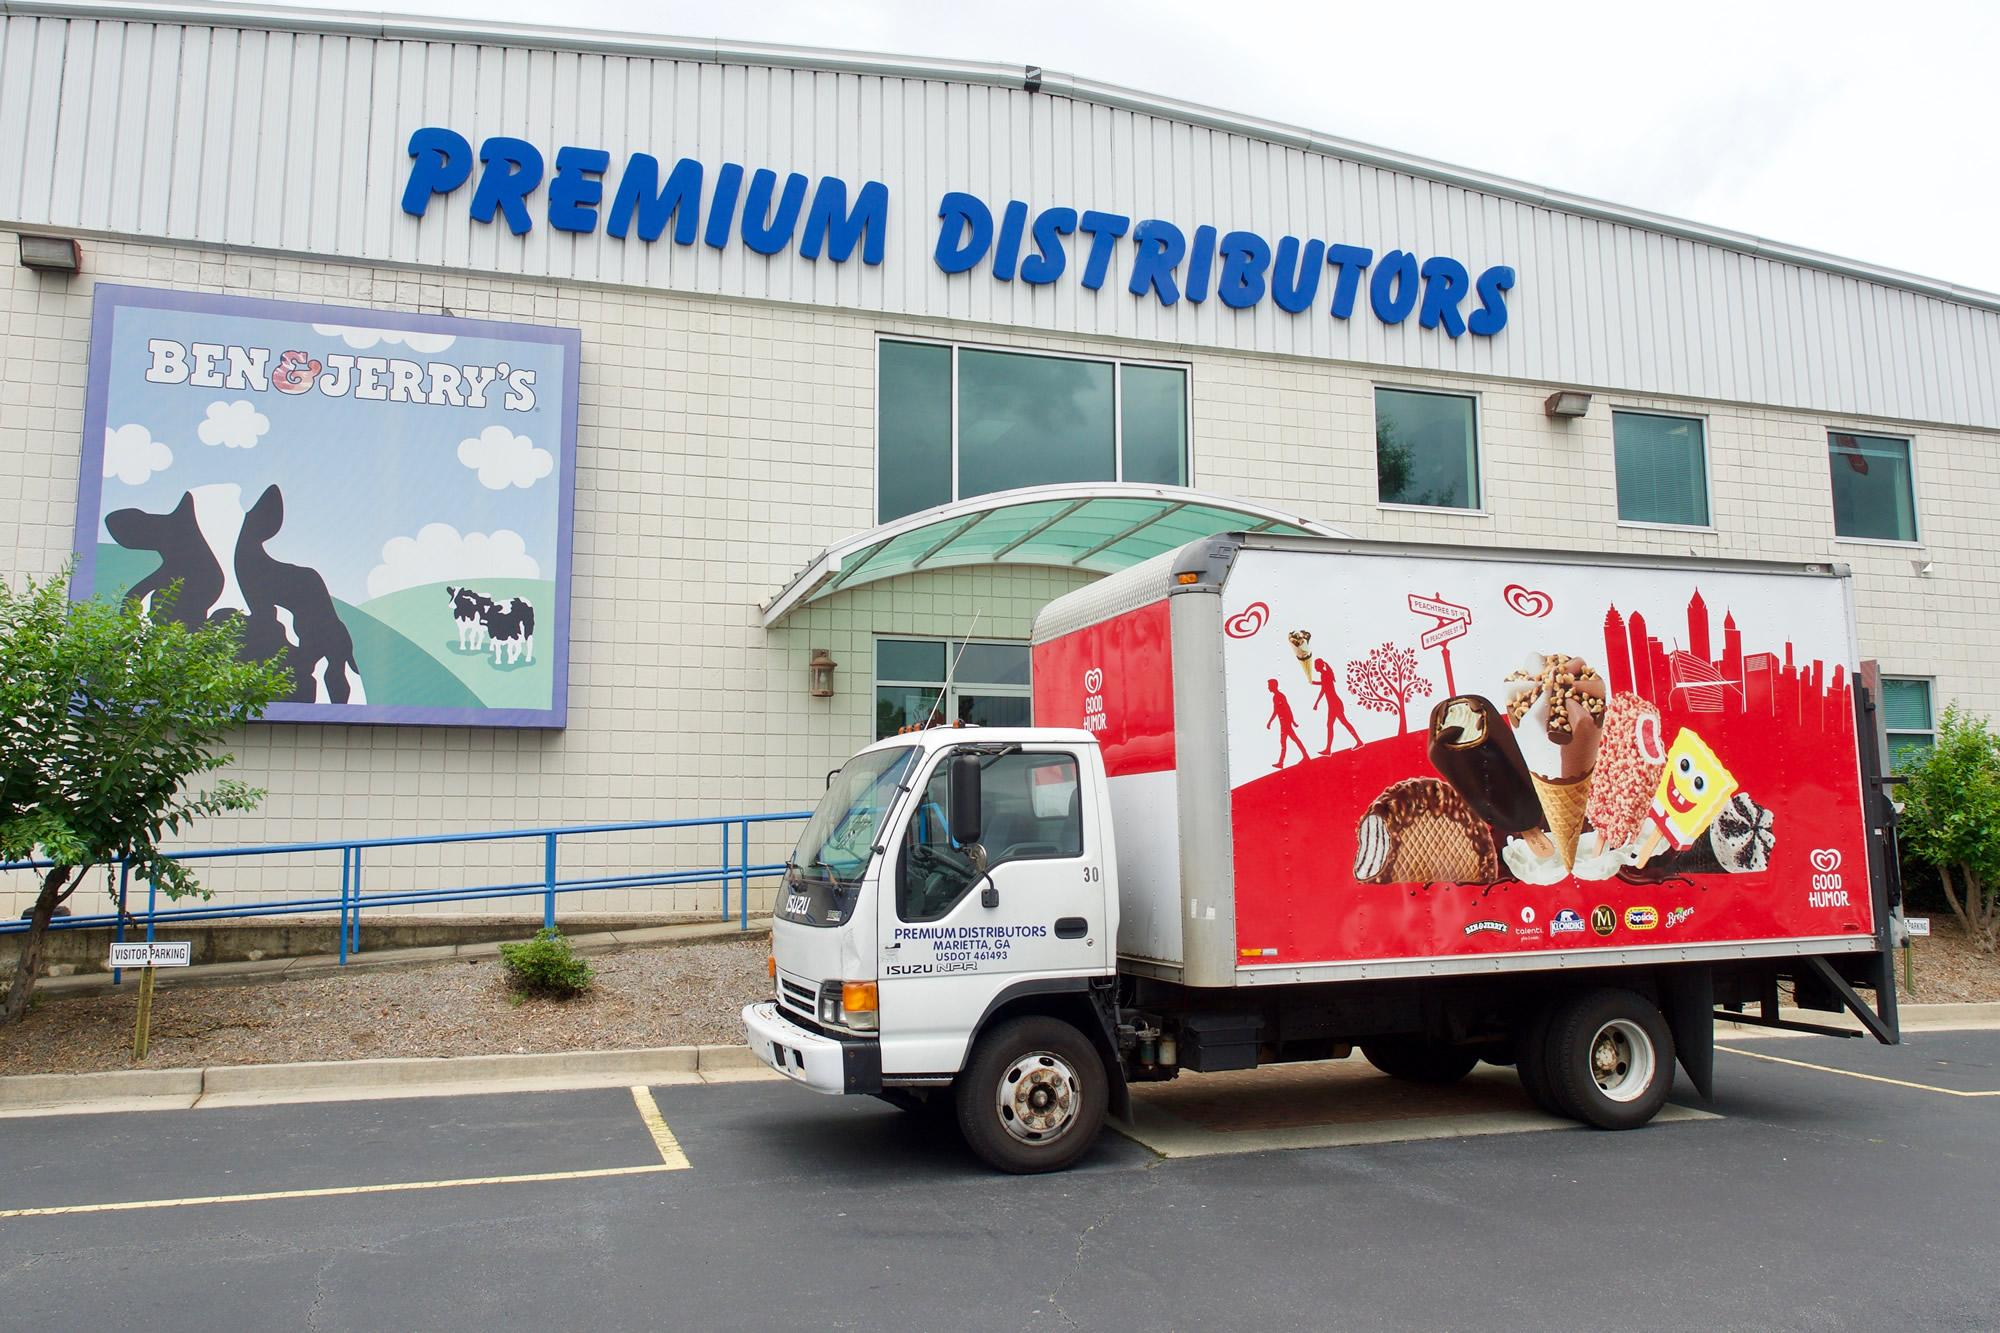 Premium Distributors